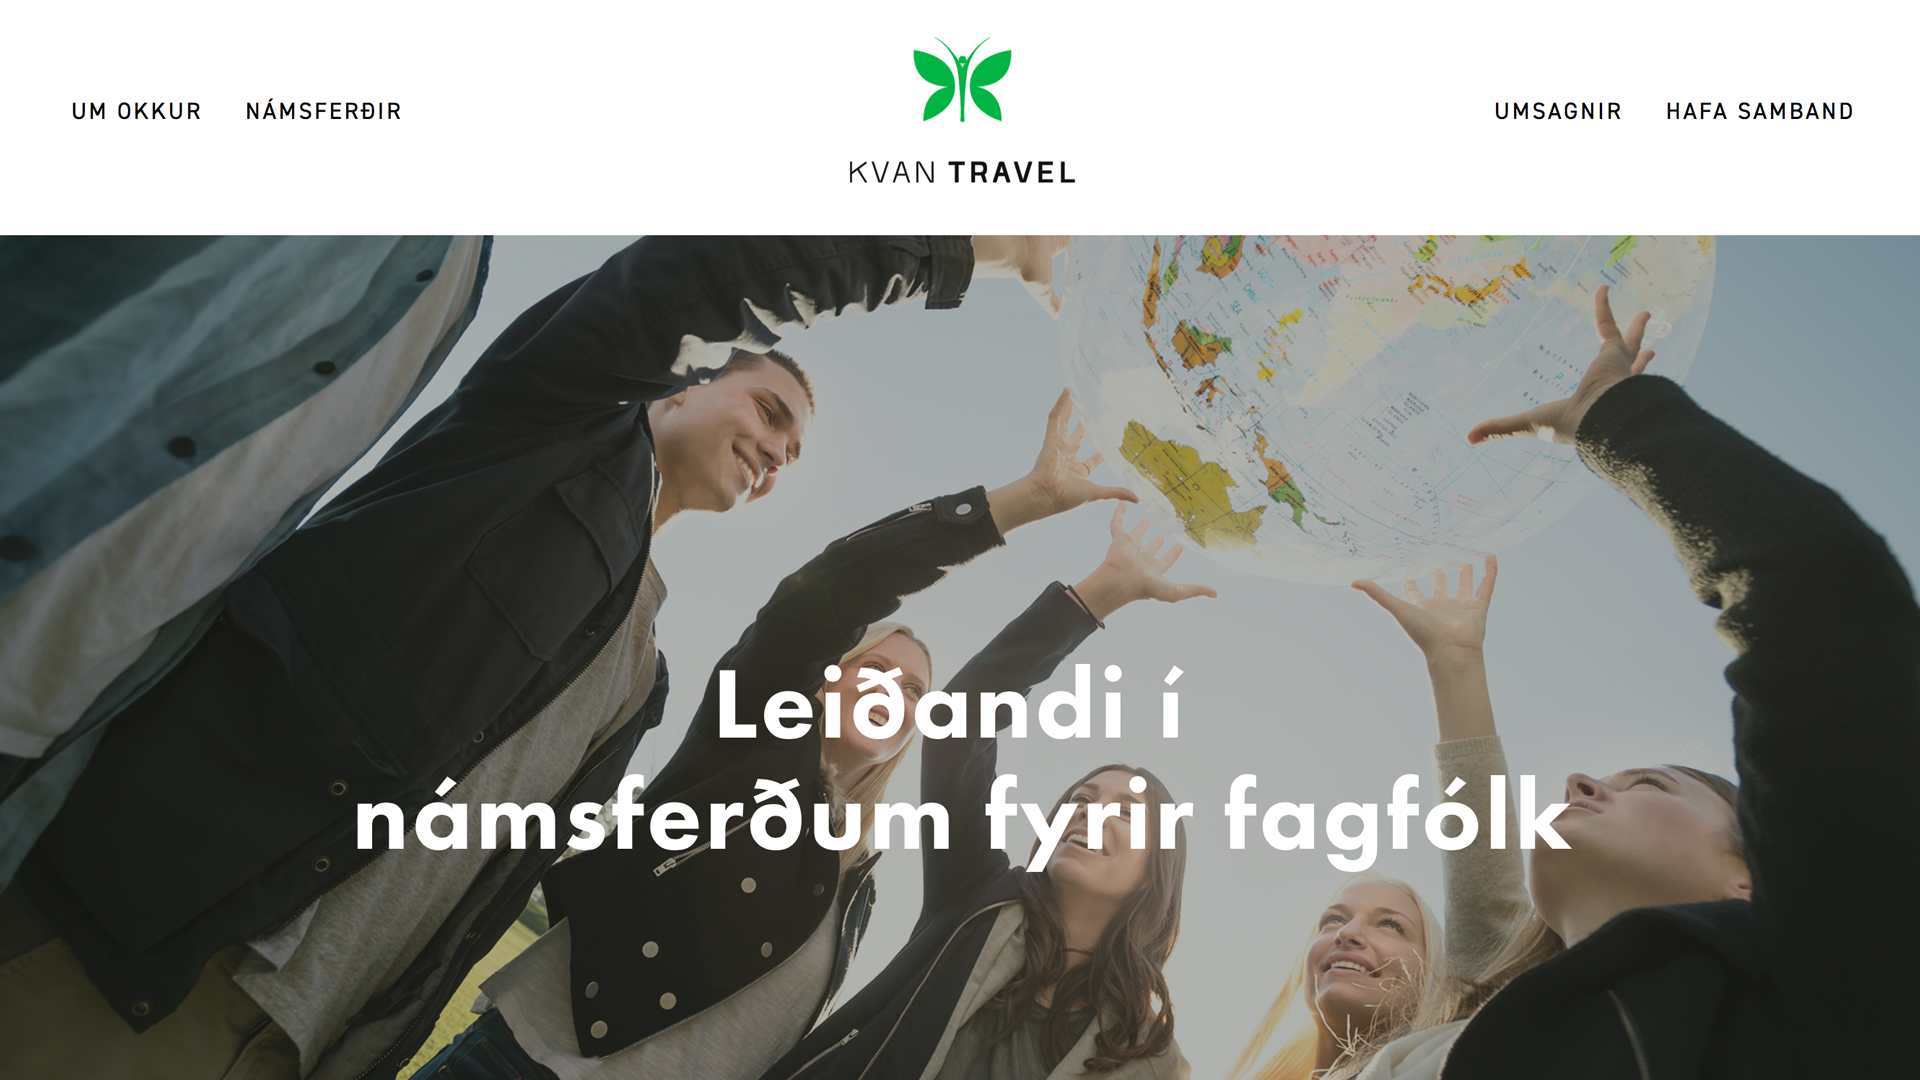 KVAN travel: web design + web development + logo design + branding